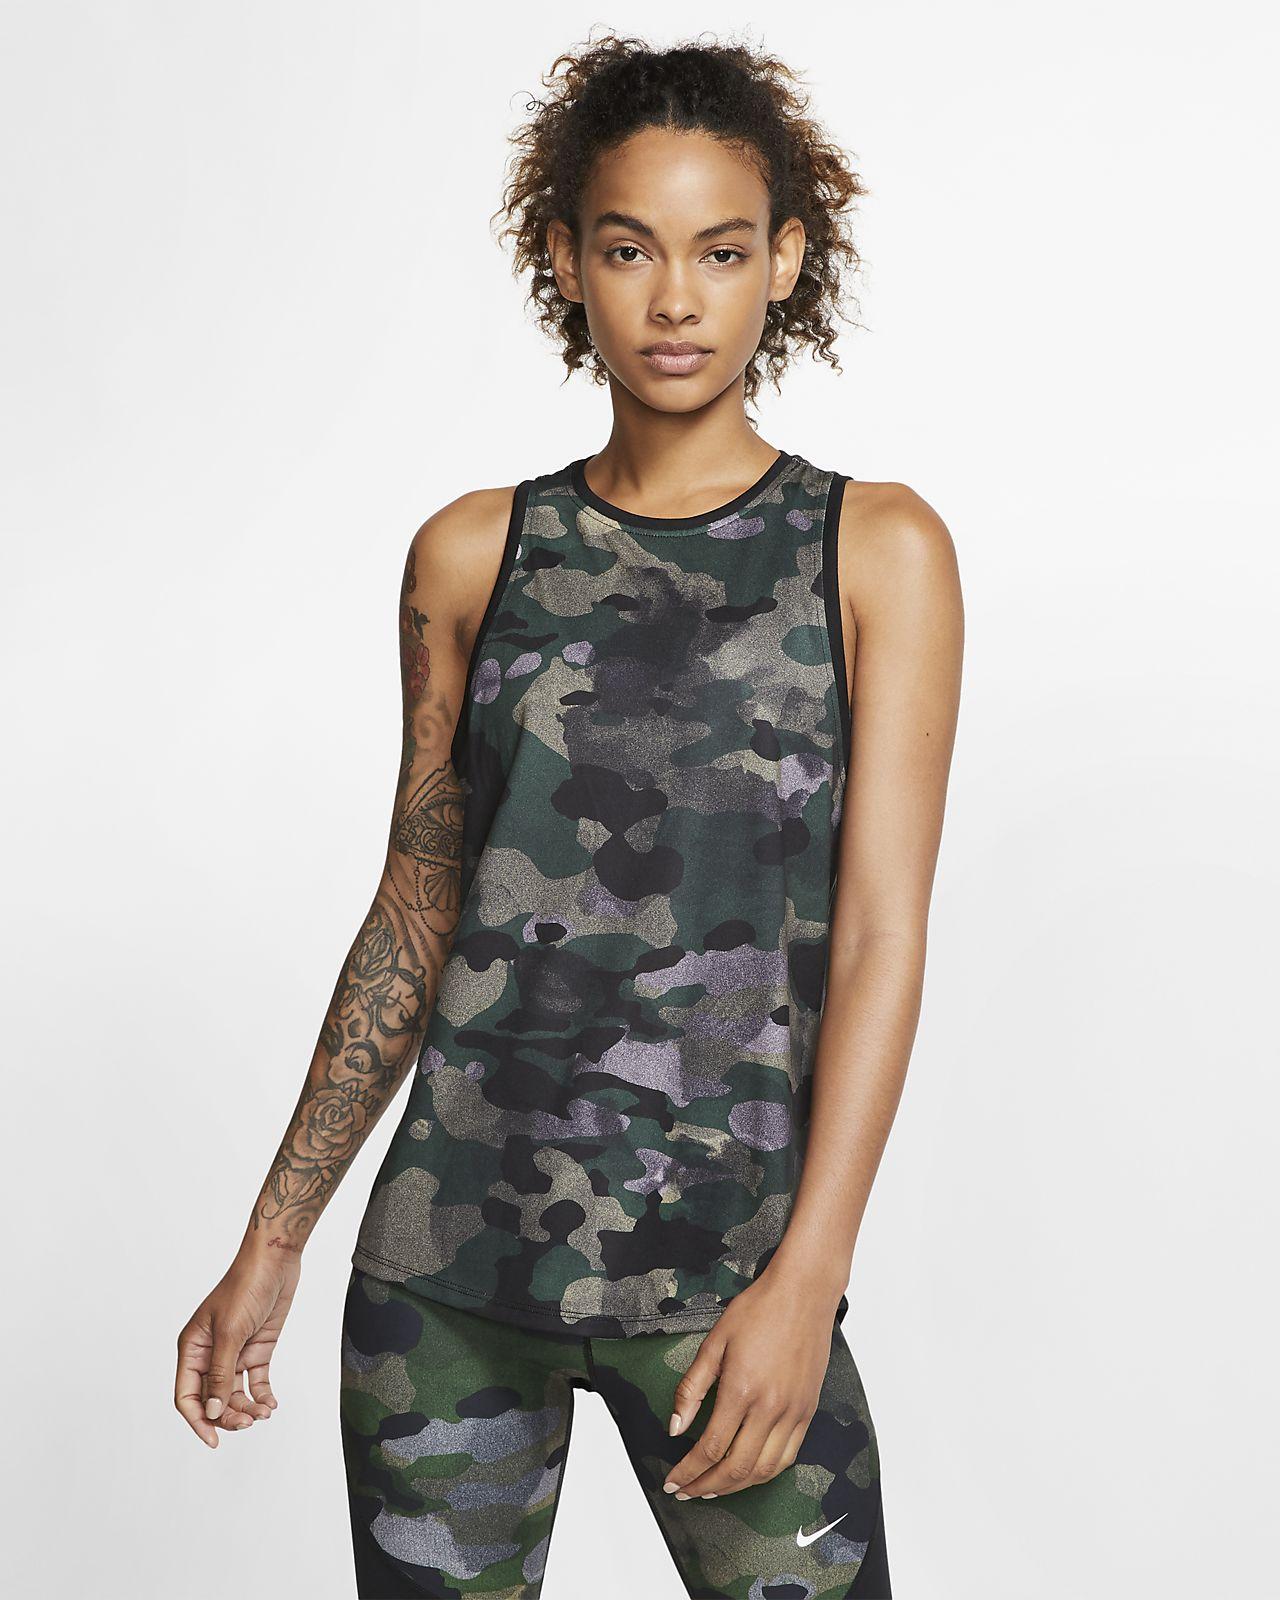 Nike Dri-FIT Trainingstanktop met camouflageprint voor dames